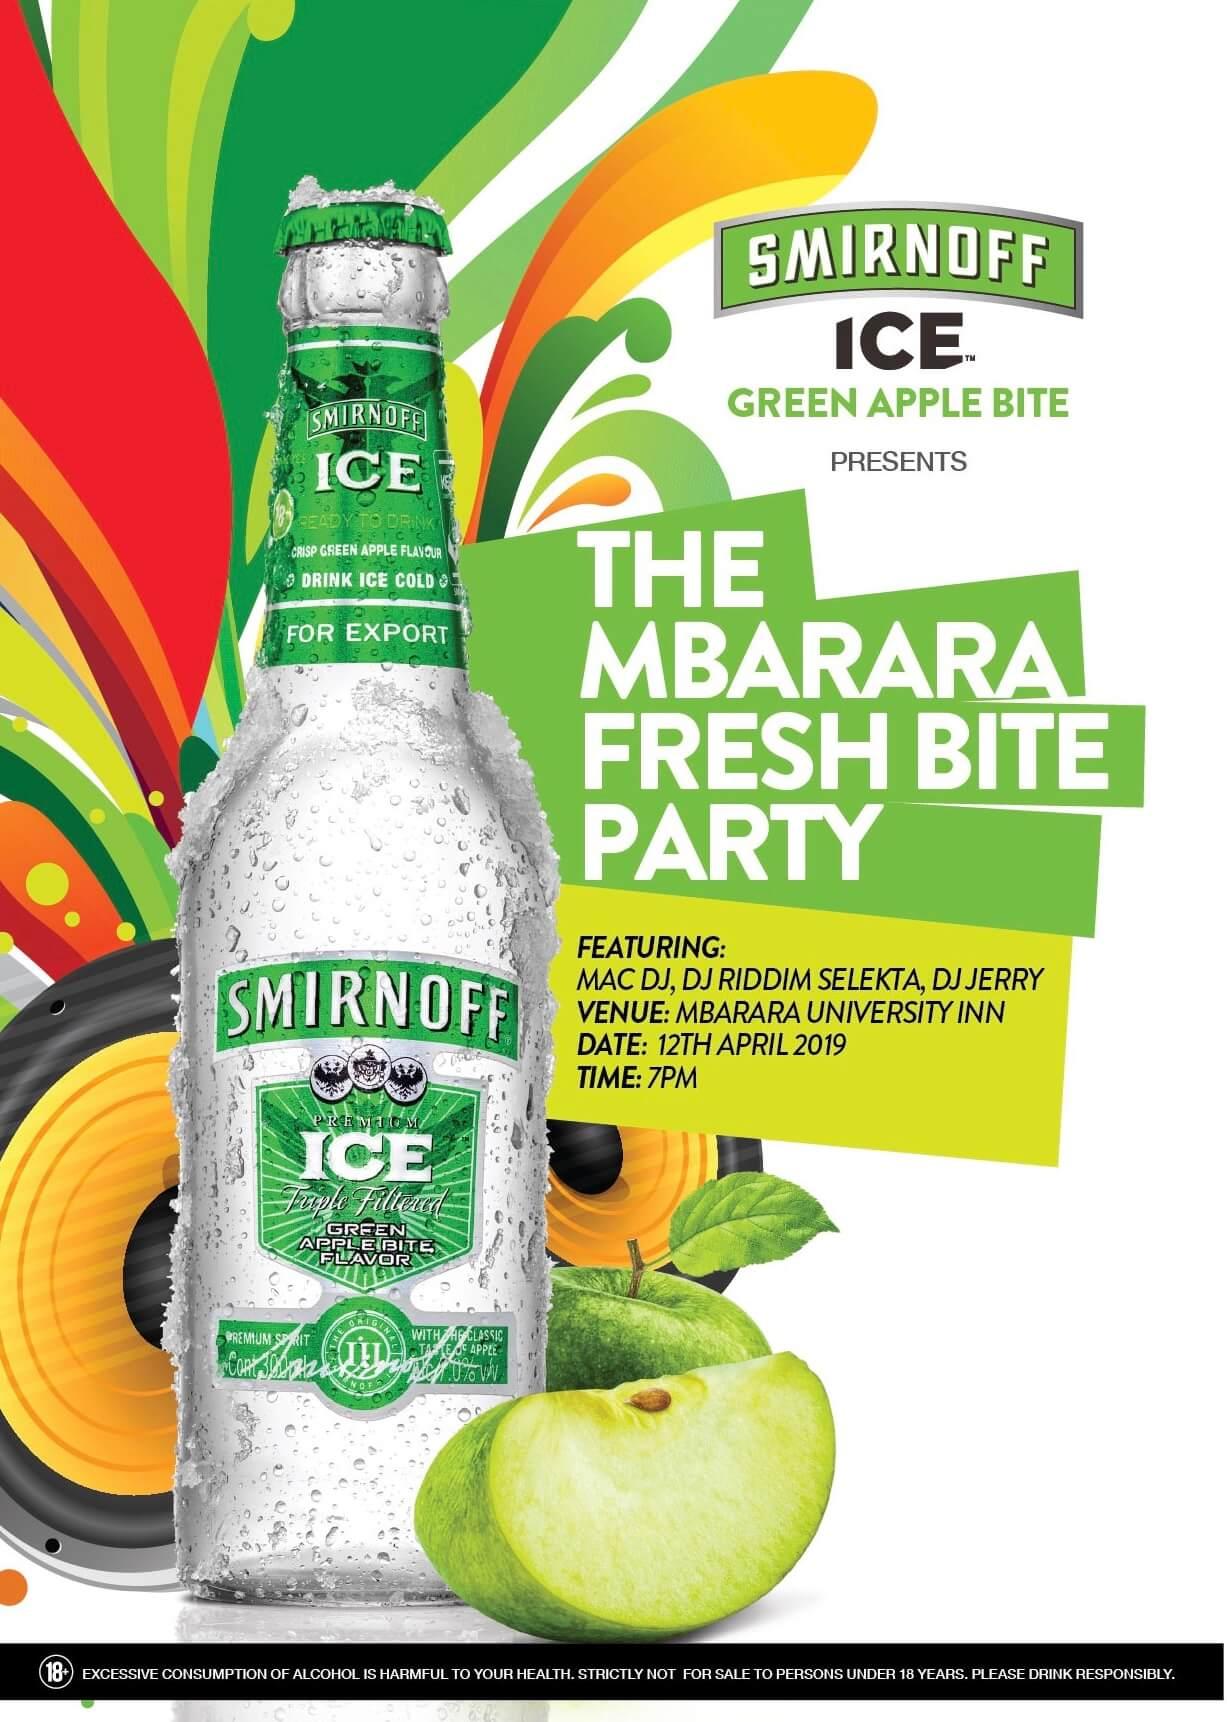 Mbarara Fresh Bite Party